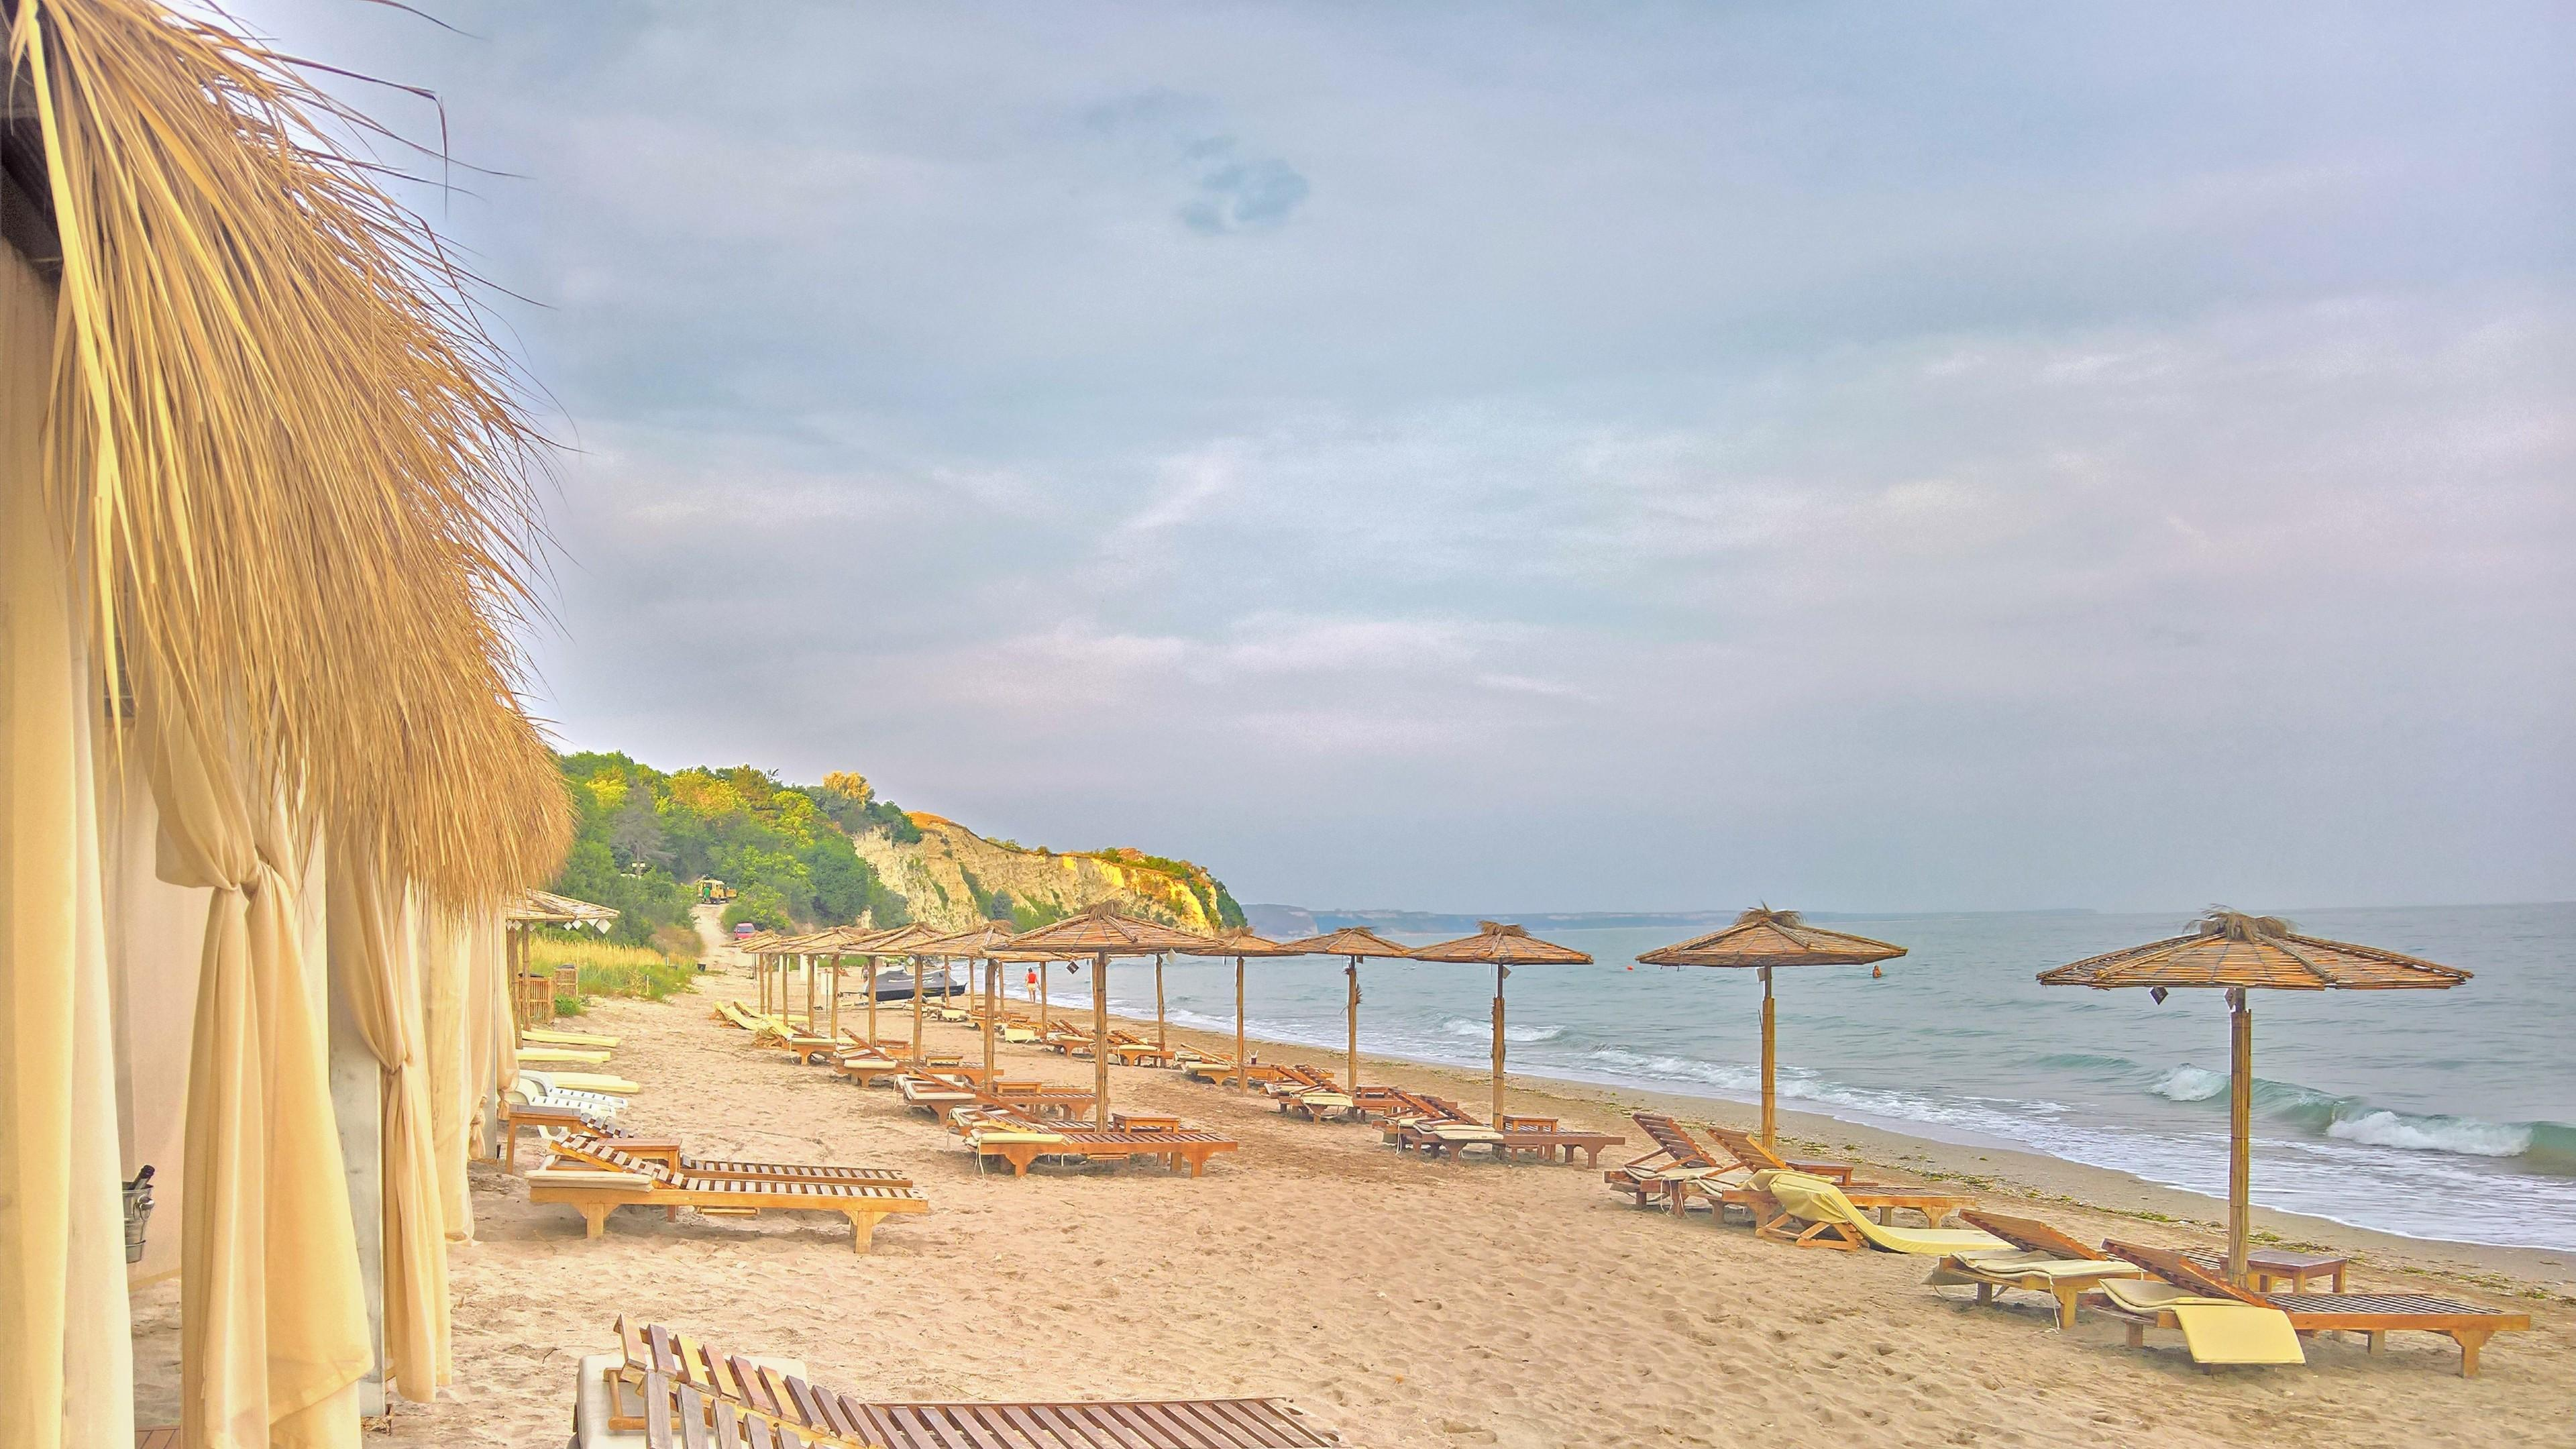 Beach in Bulgaria wallpaper